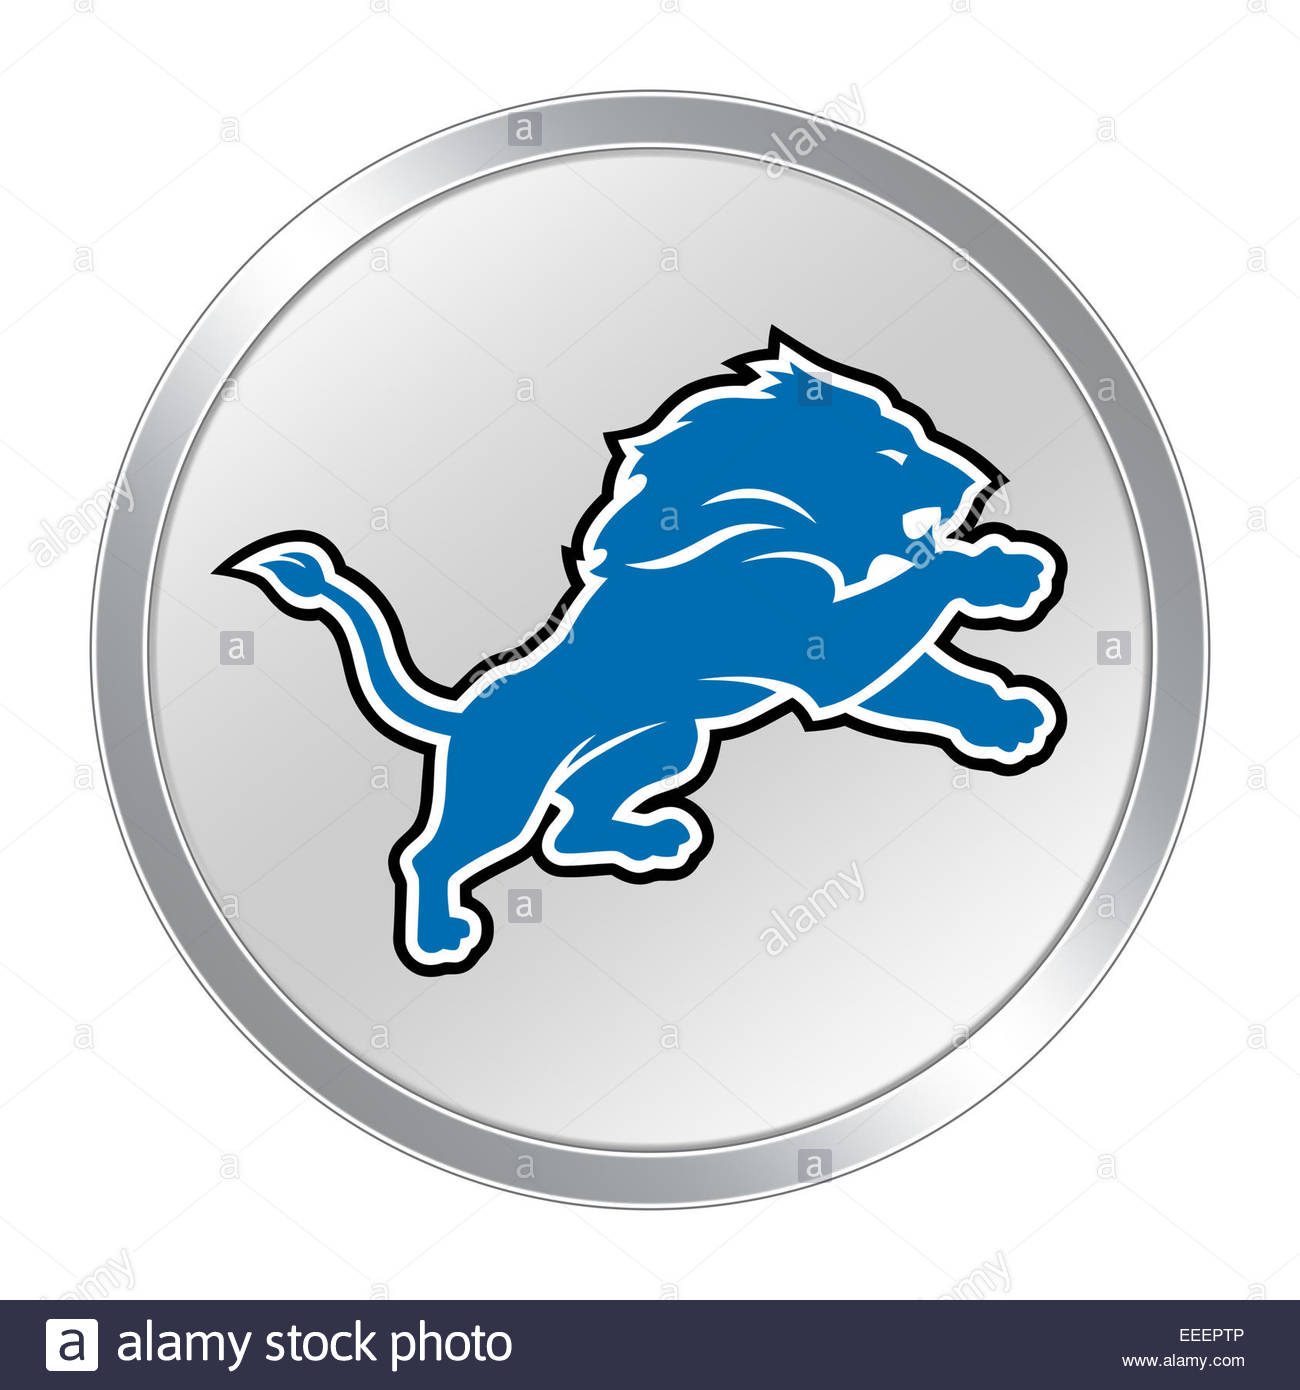 detroit lions logo icon button